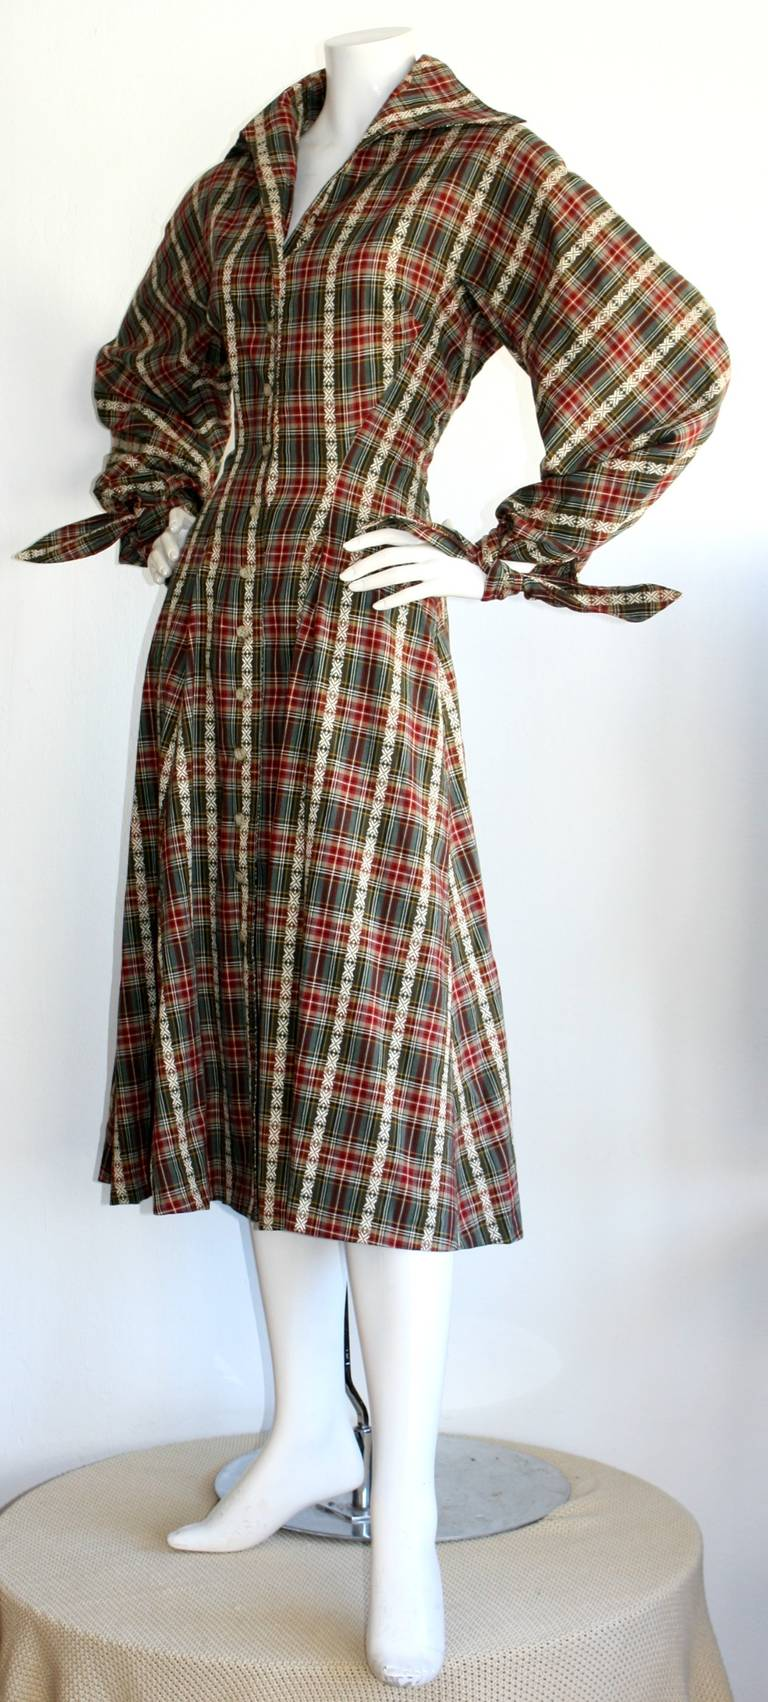 Black Vintage Byron Lars Tartan Plaid Tie Bow Shirt Dress For Sale